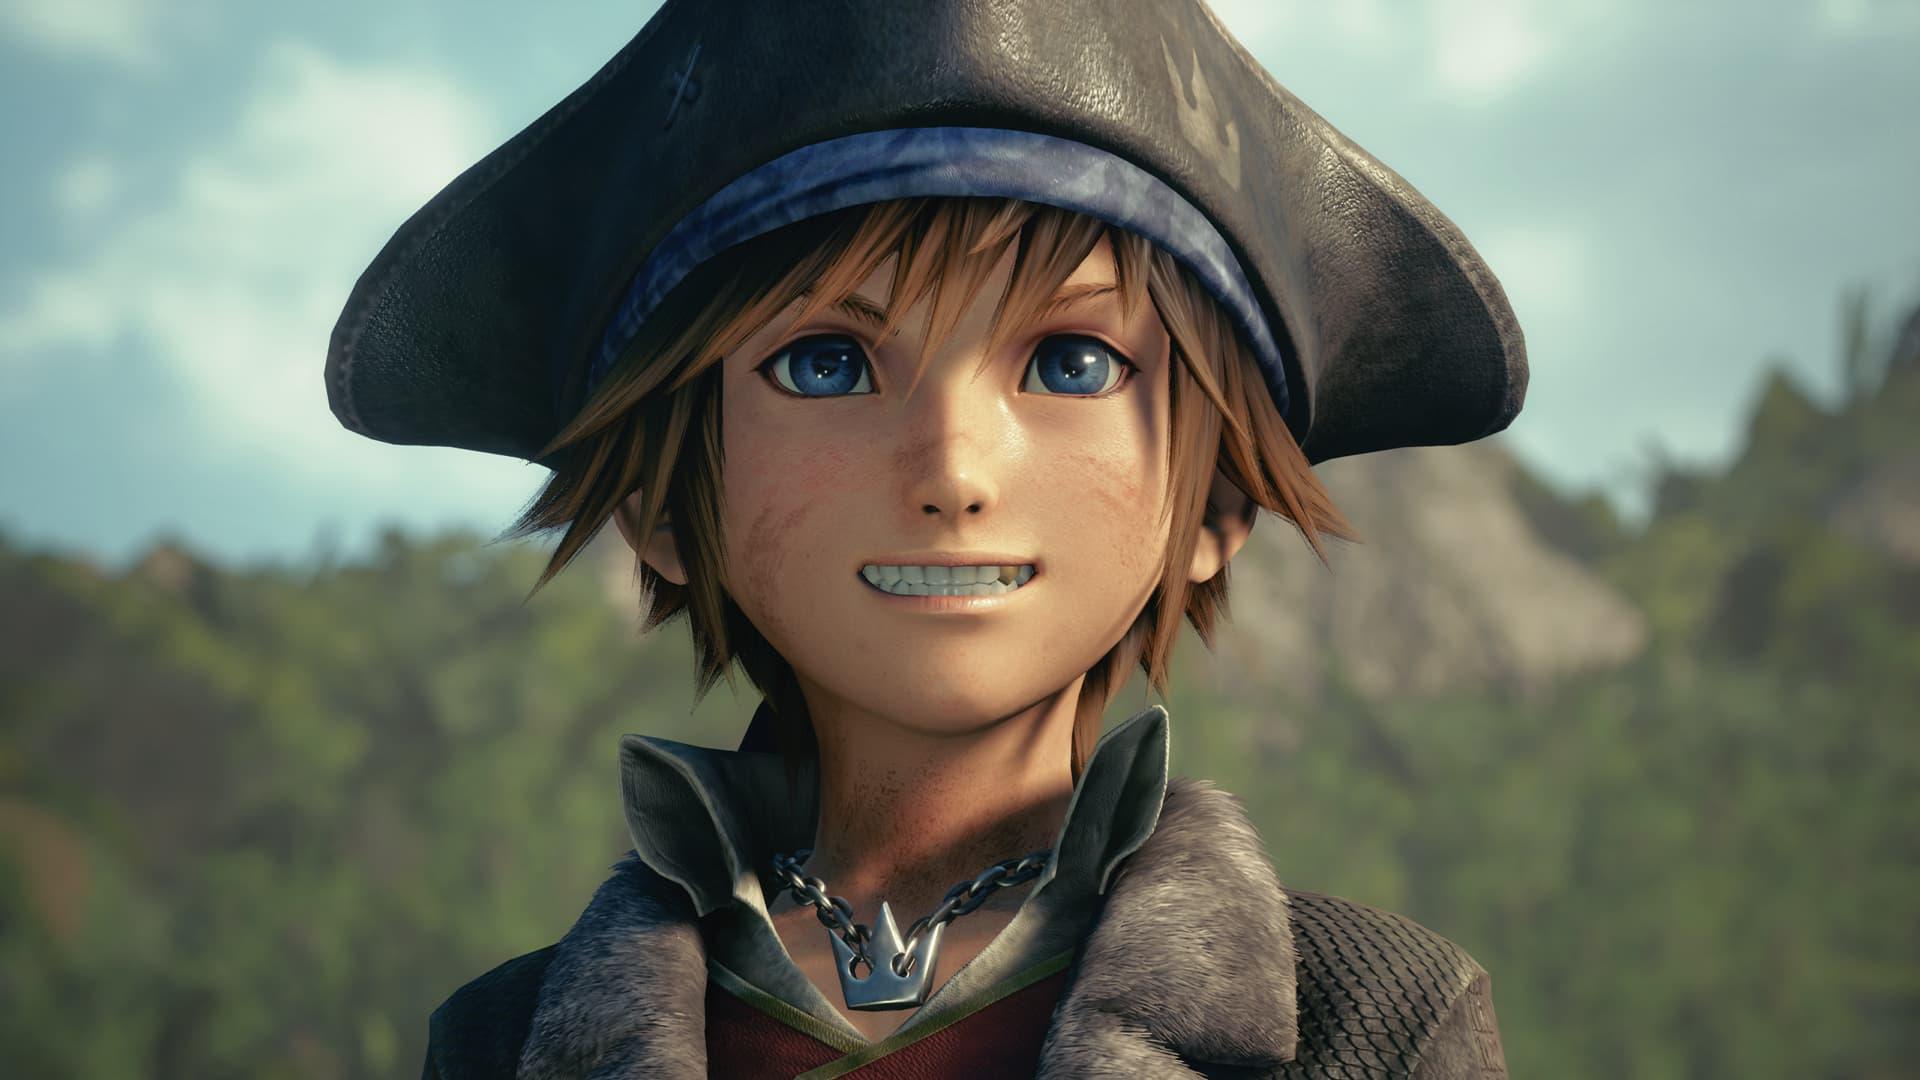 Análisis de Kingdom Hearts III - Xbox One 6